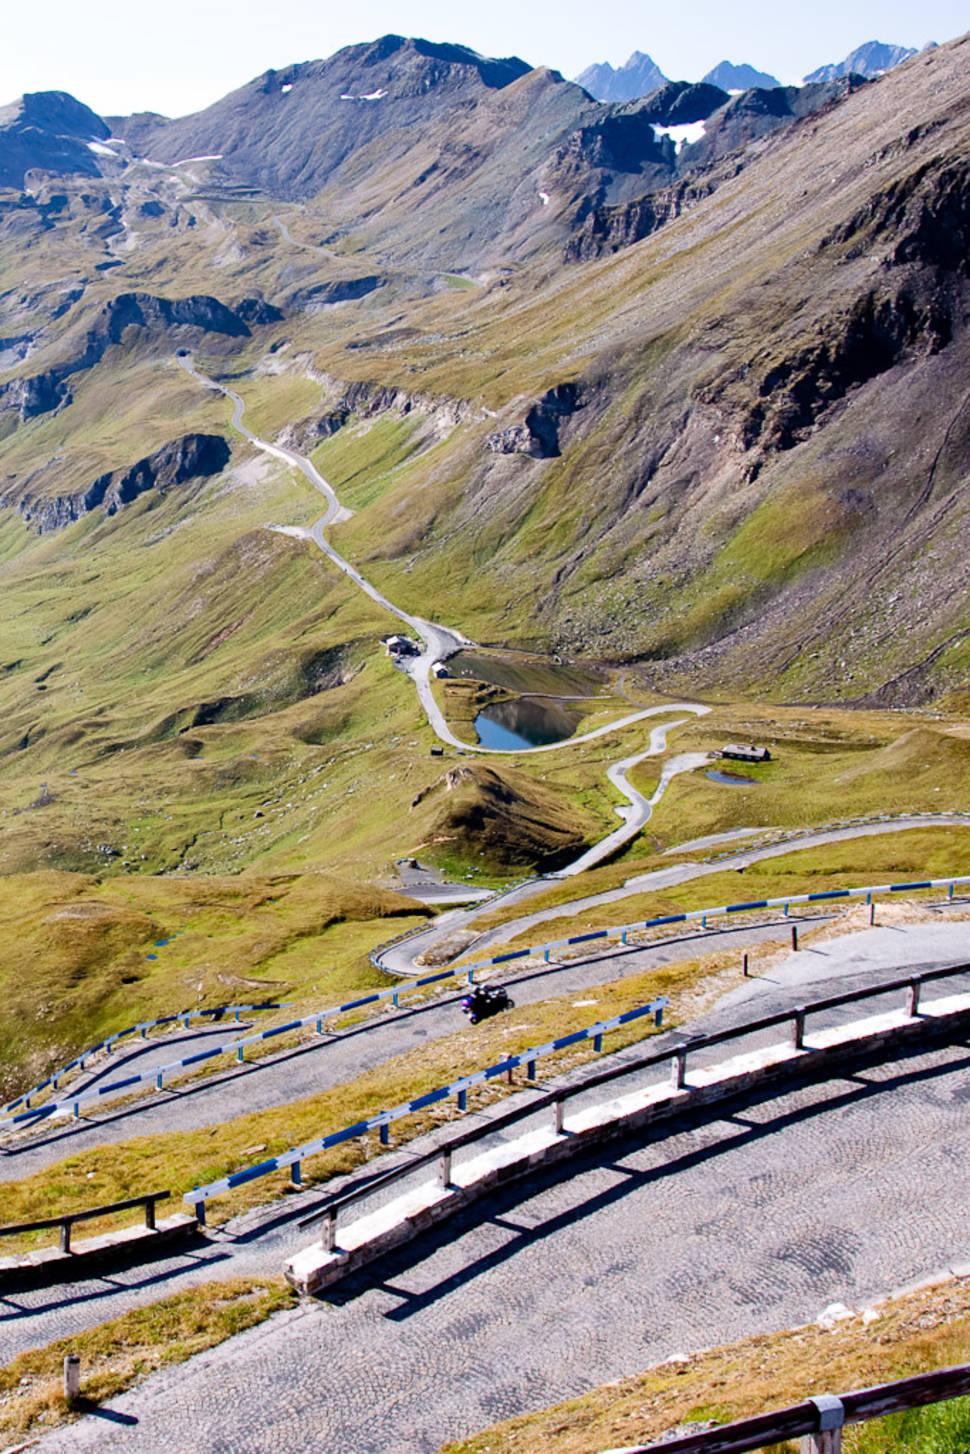 Best time to see Grossglockner High Alpine Road in Austria